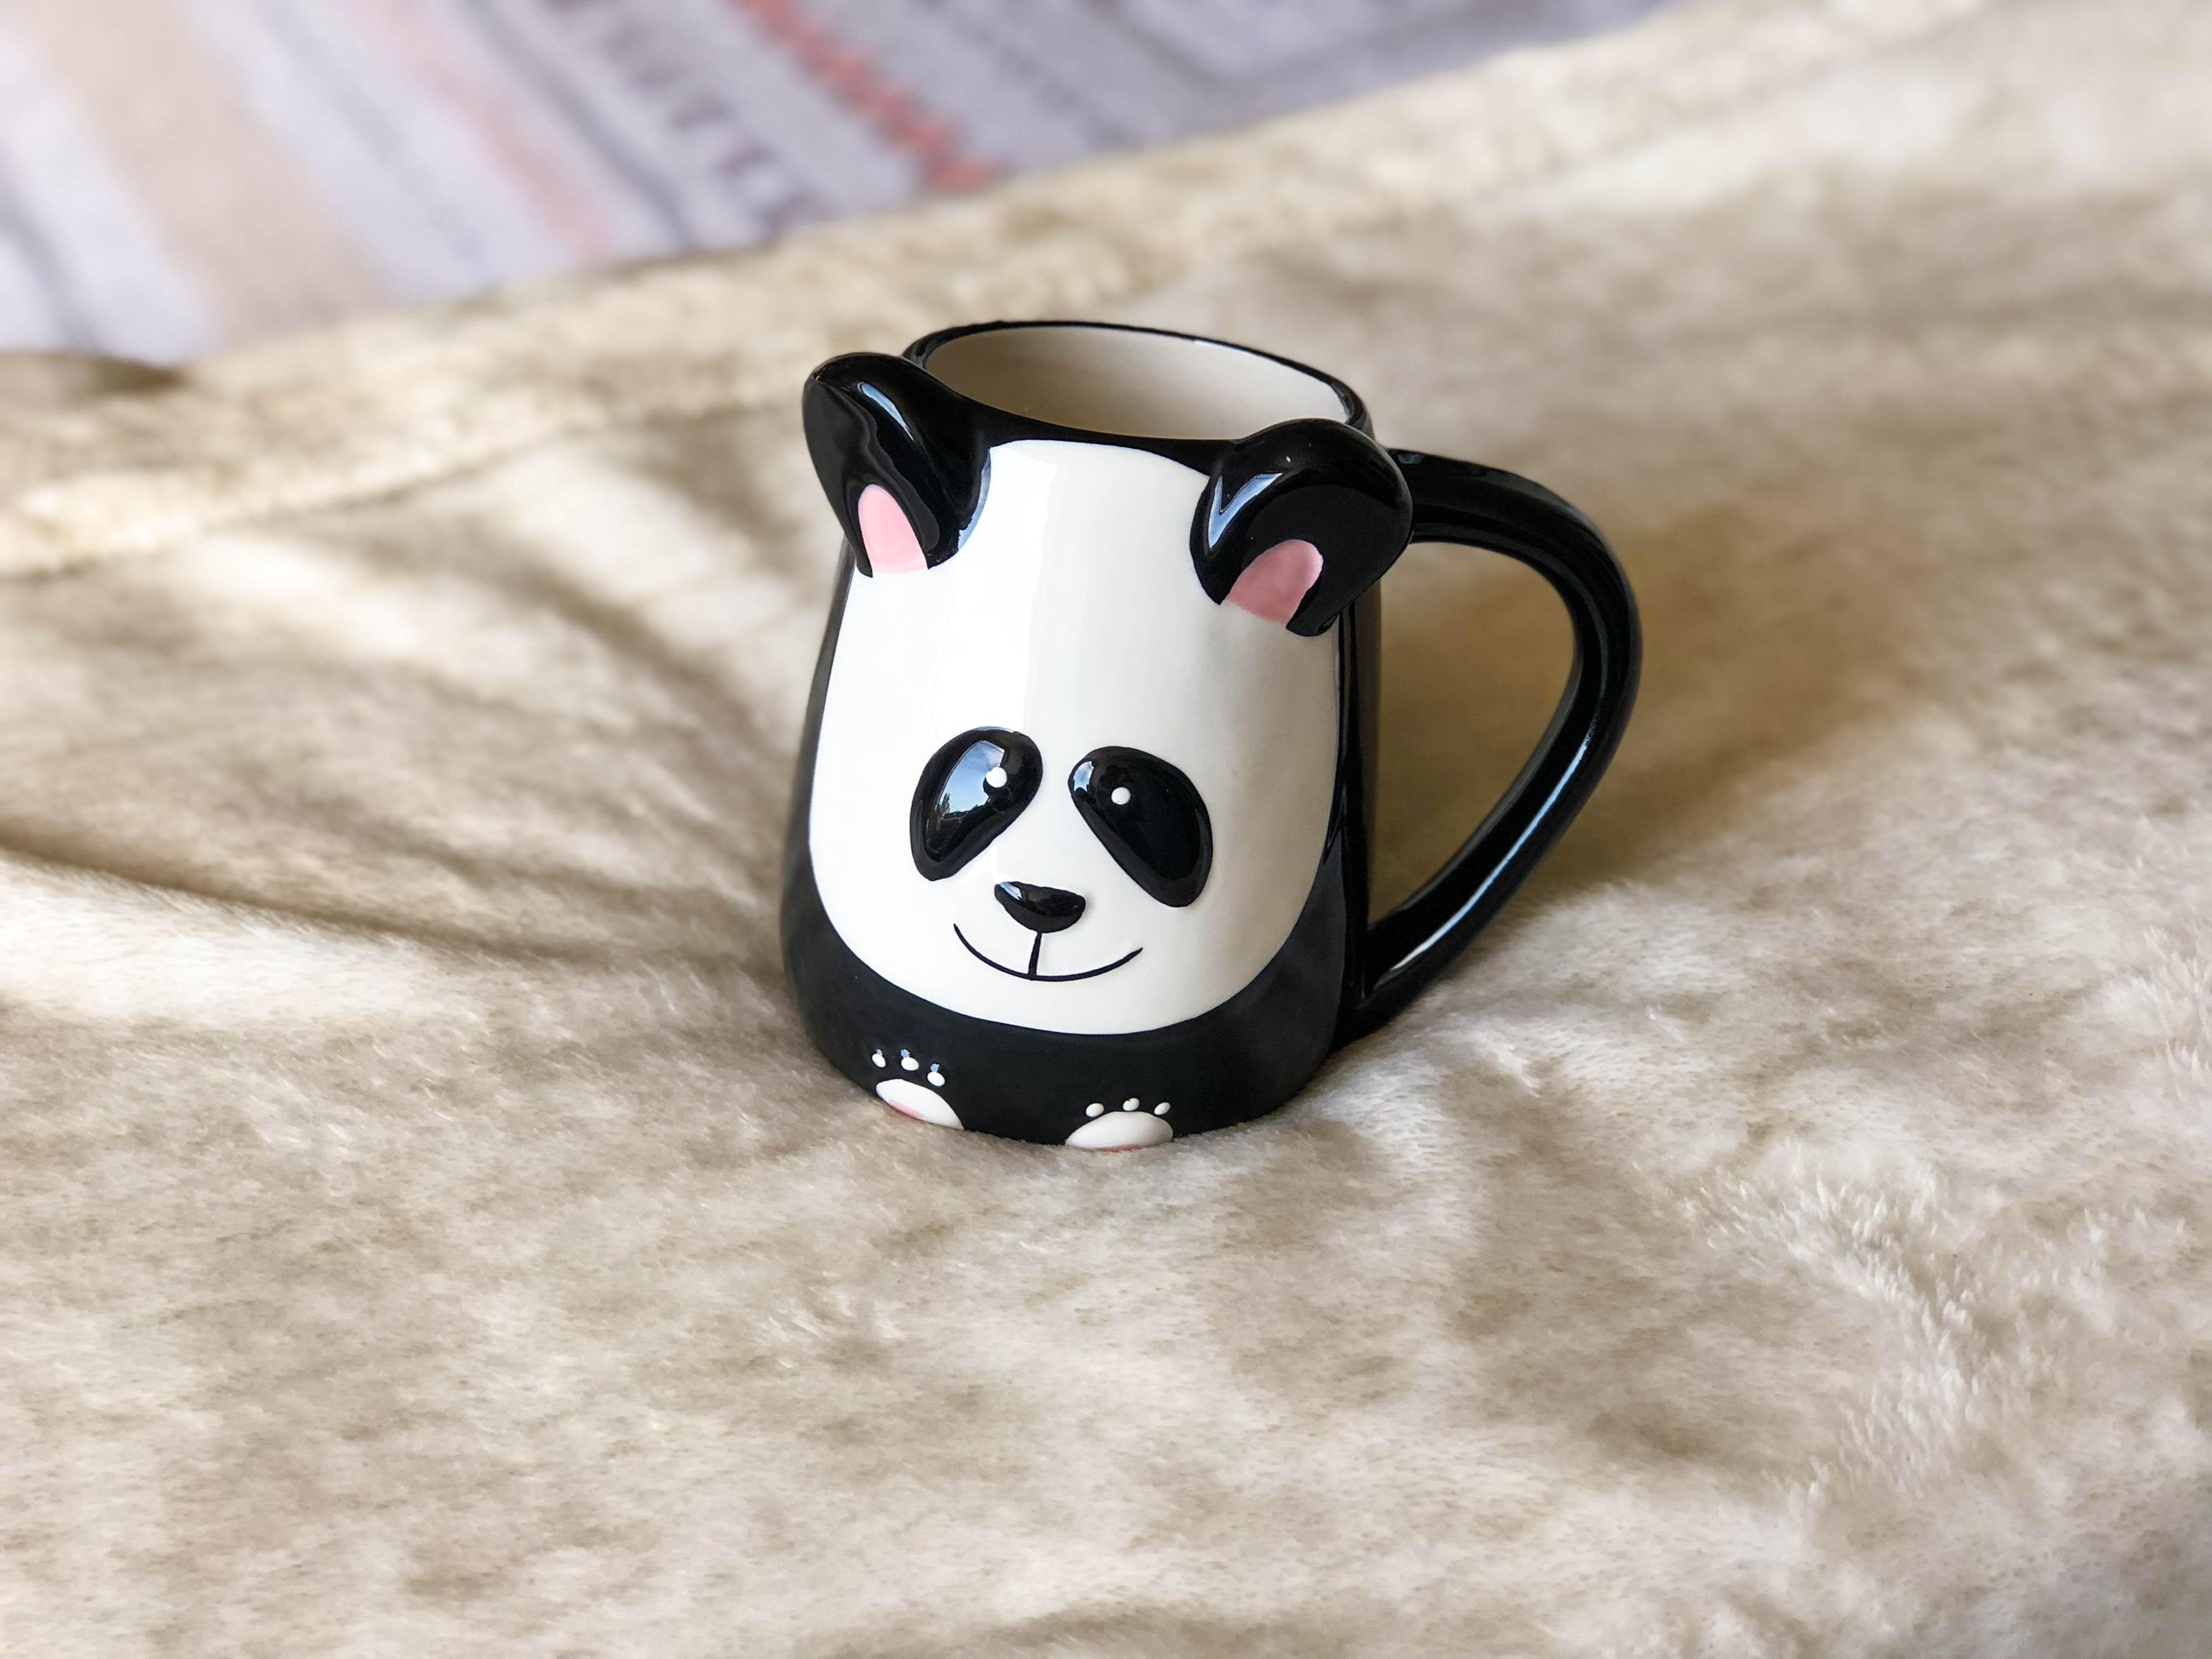 Panda mug (1 of 1)